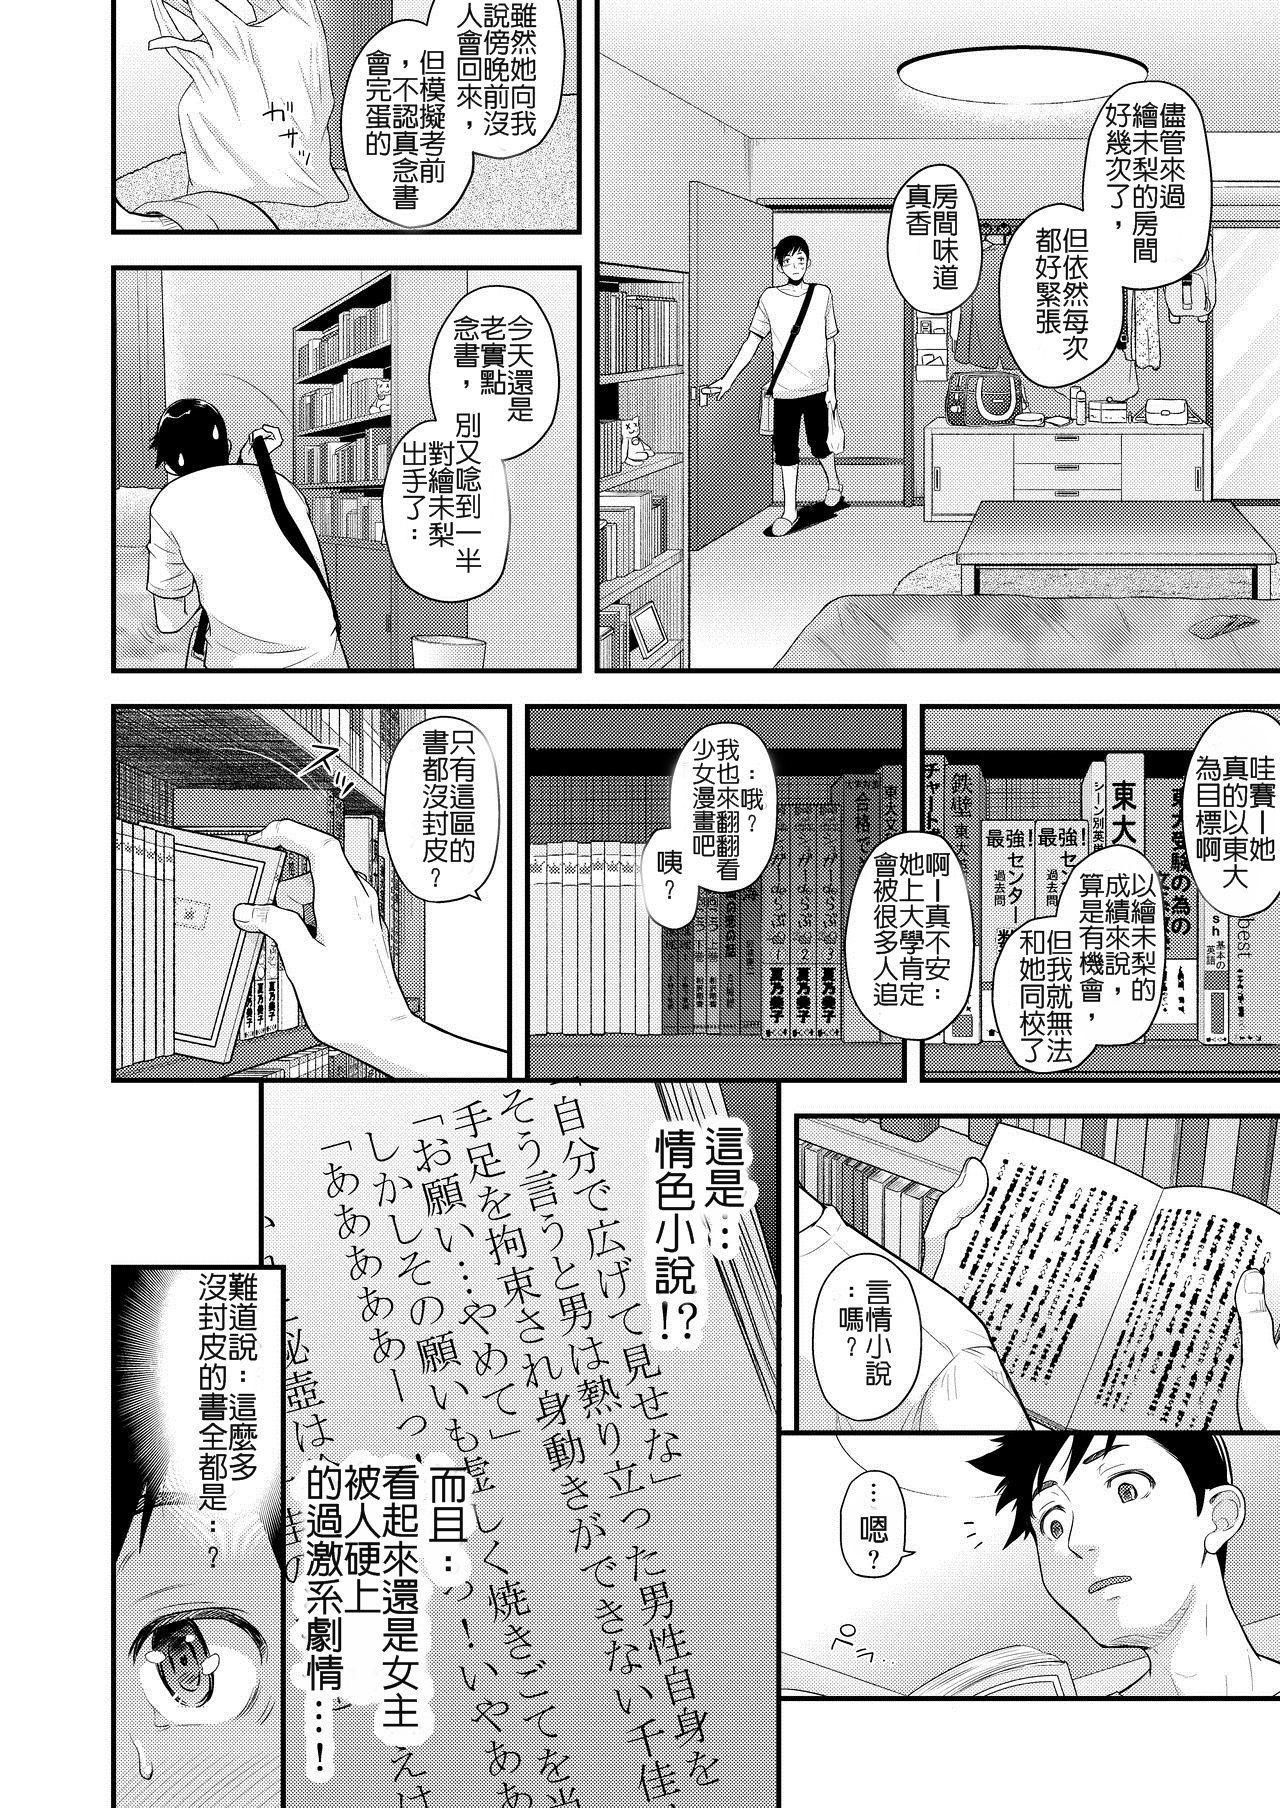 [T.cop (Natsuki Kiyohito)] Jimiko to Ichinichijuu Sex 4 - Futarikiri no Juken Benkyou wa... | 和土妹子搞上一整天-只有兩人的讀書會 [Chinese] [Digital] 3